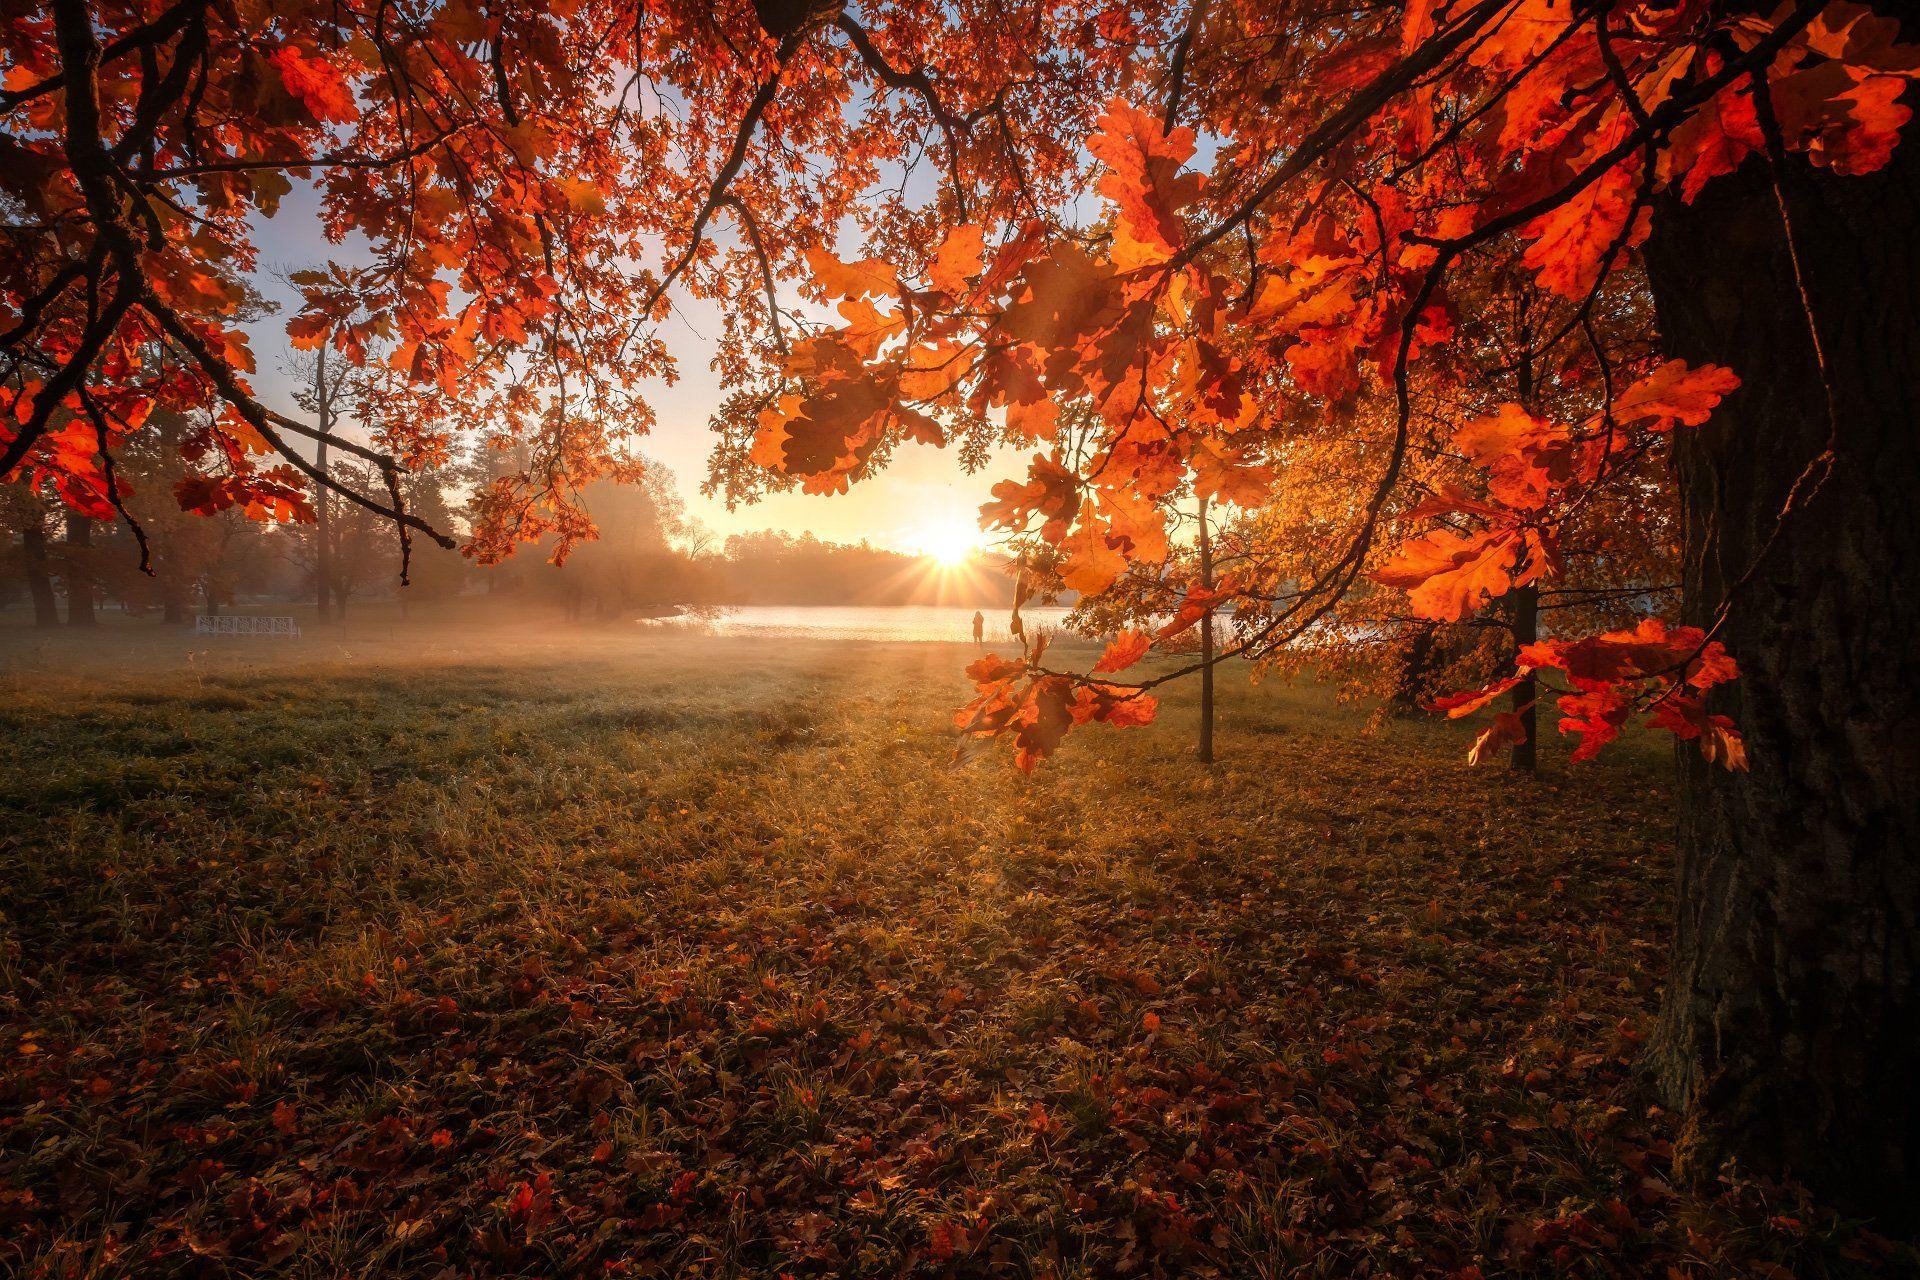 Солнце в листьях.  Андрей Чиж